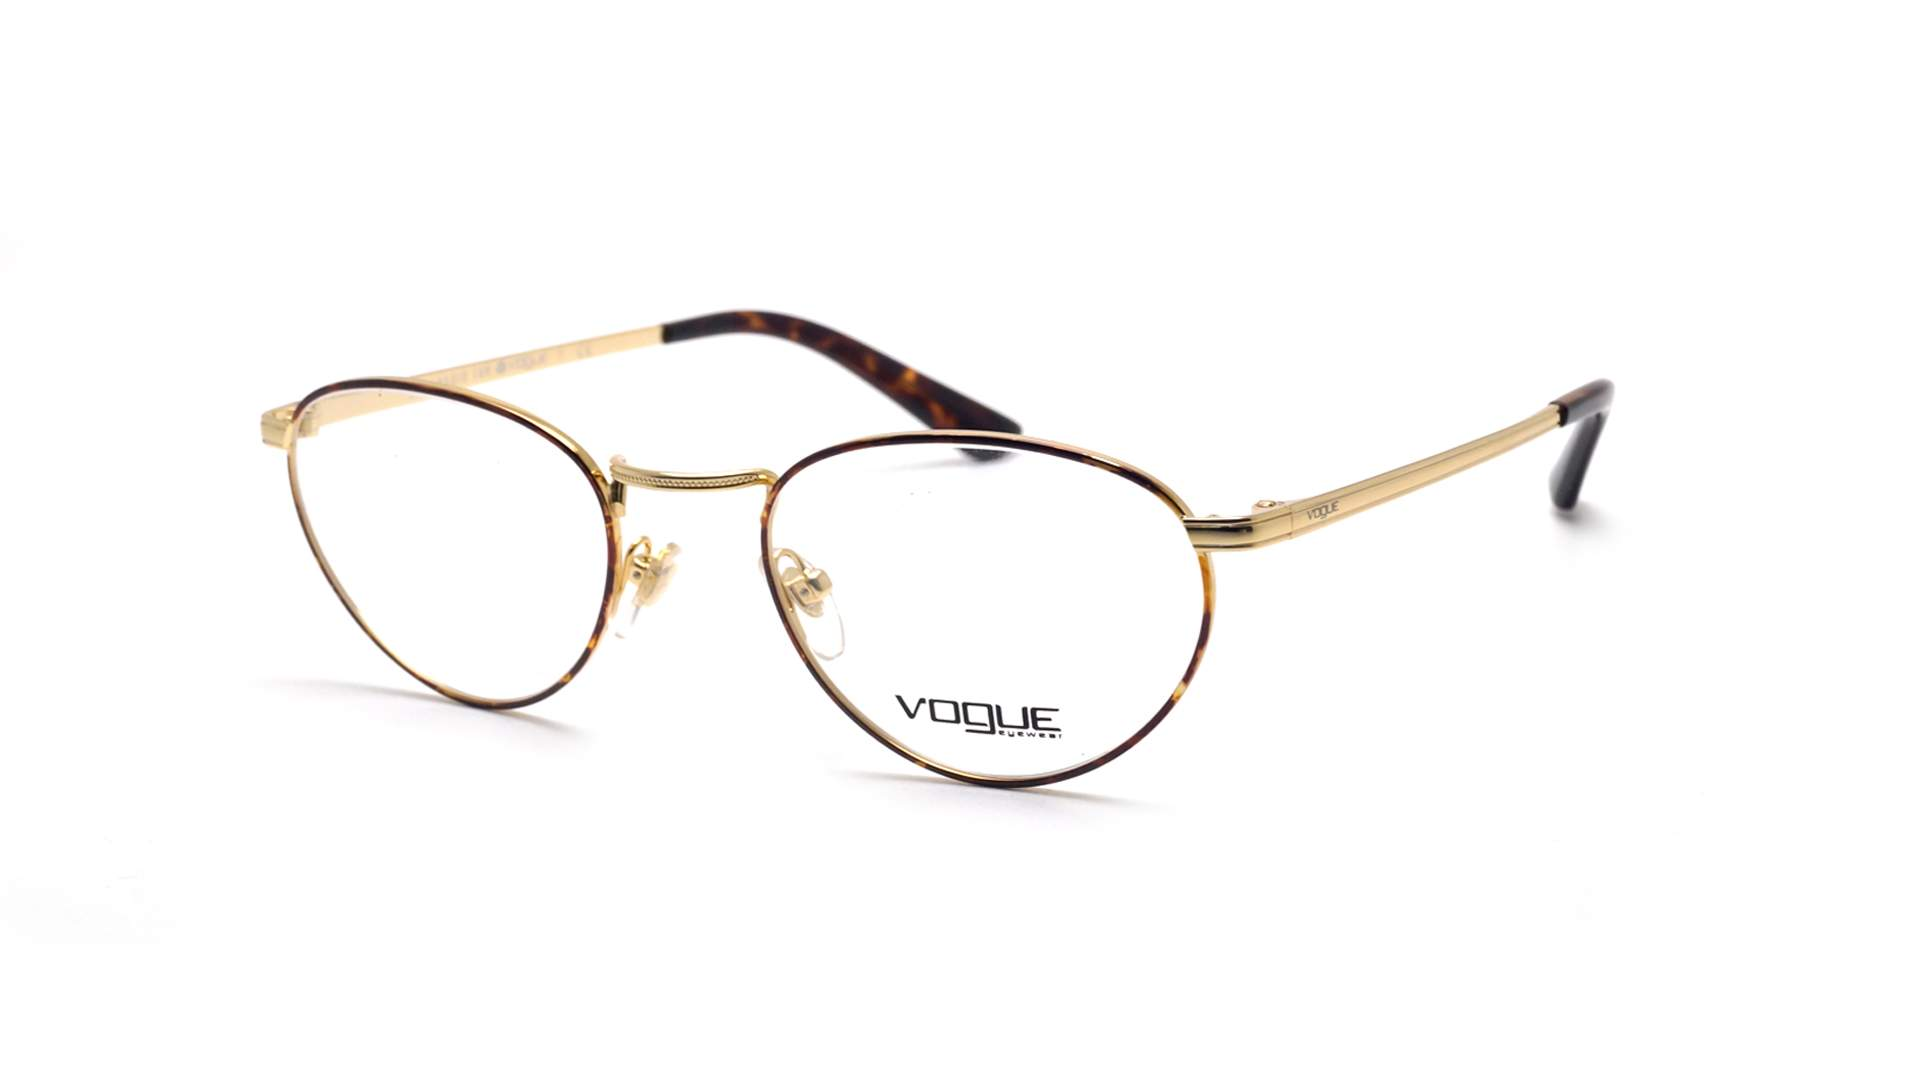 Vogue Vo4084 Gigi Small Hadid 50 5078 Écaille 20 xoWBrdQeCE